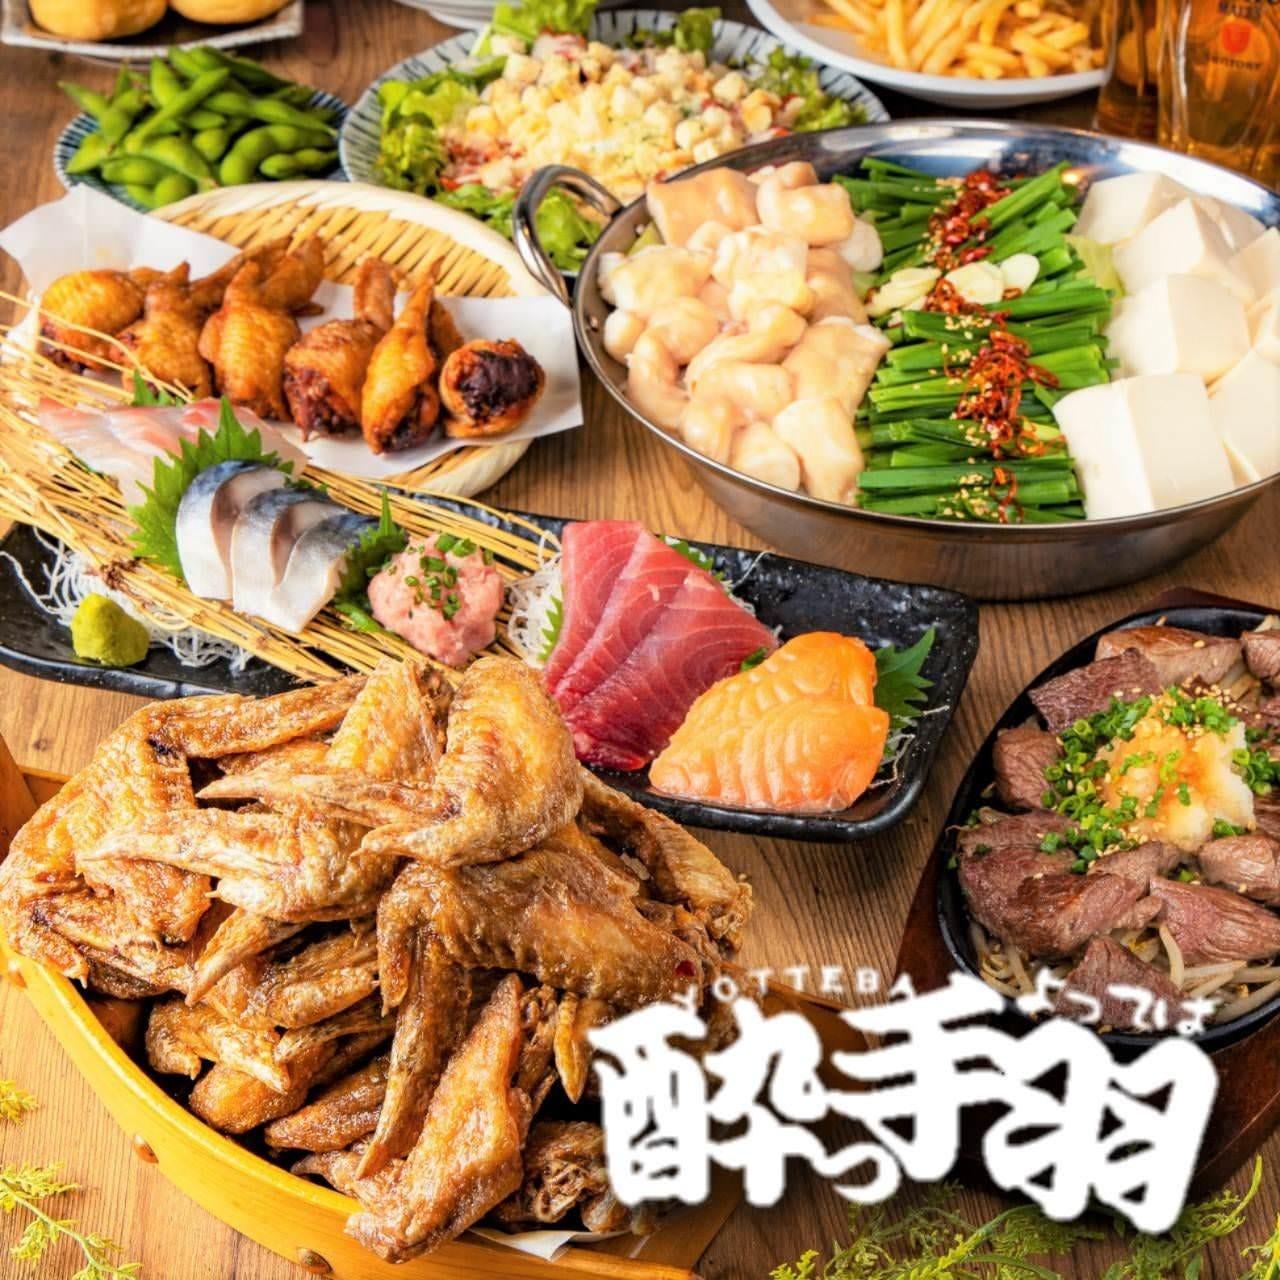 全116品食べ飲み放題 個室居酒屋 酔っ手羽 蒲田店